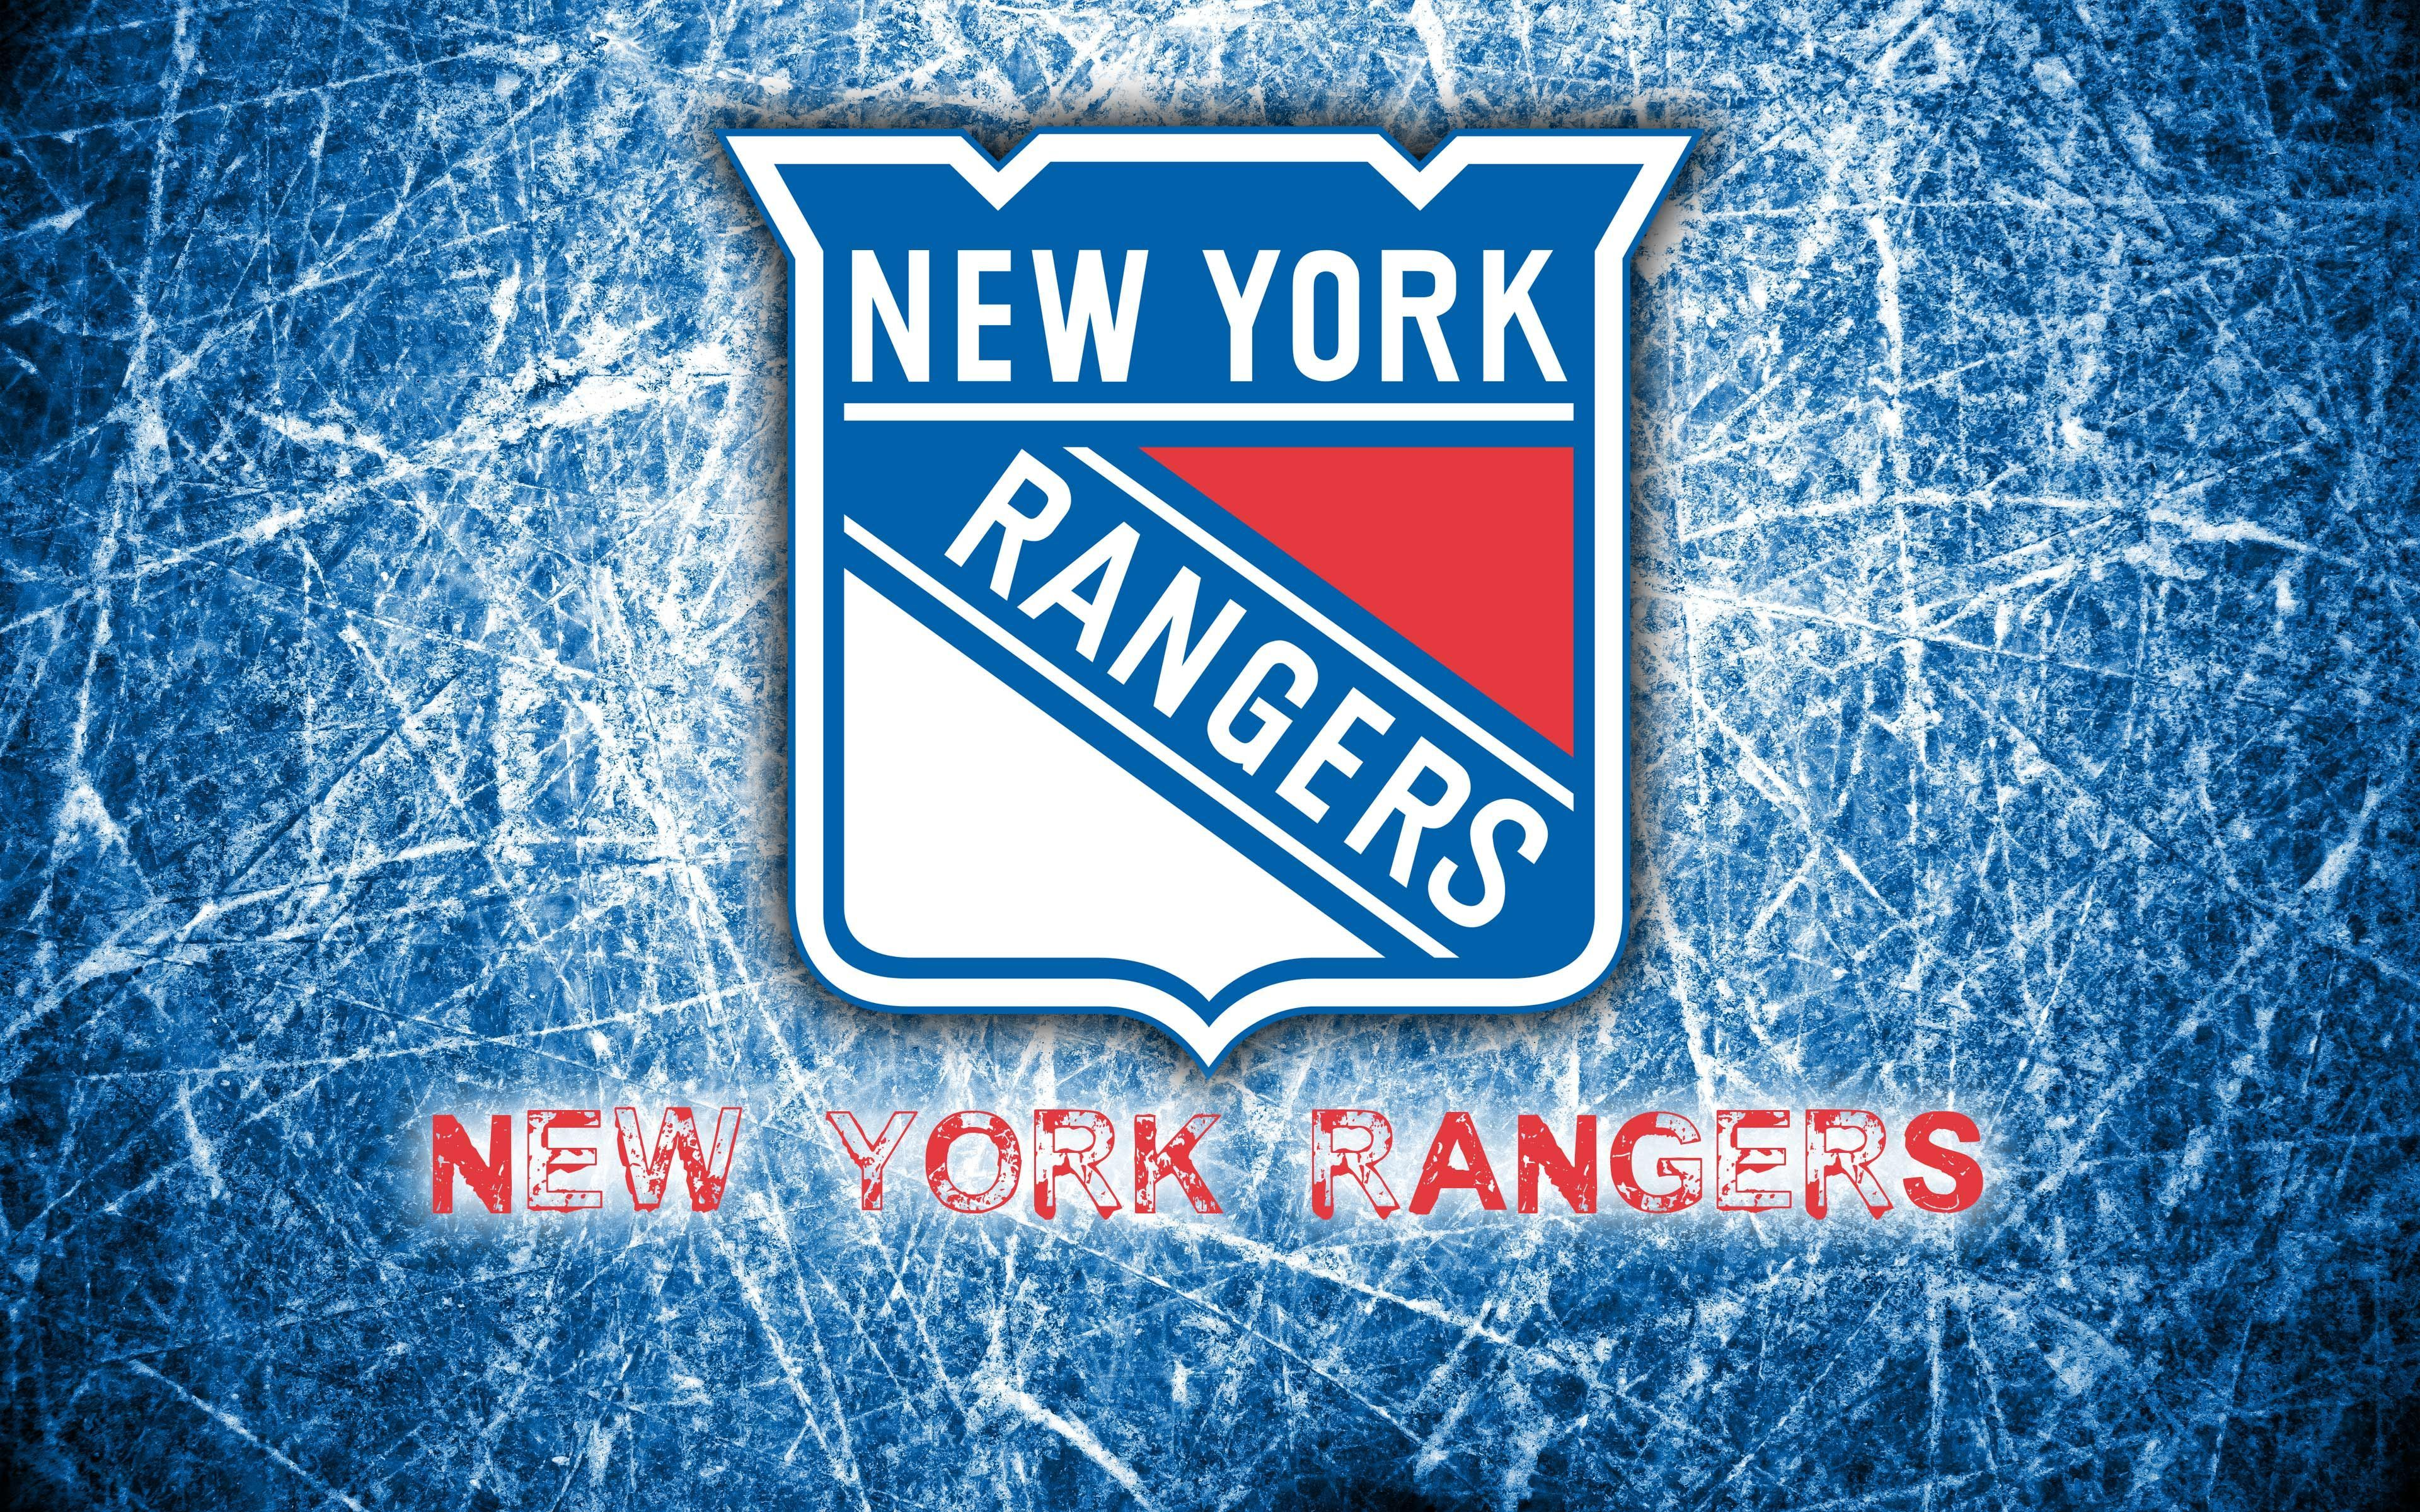 New York Rangers Wallpapers Top Free New York Rangers Backgrounds Wallpaperaccess